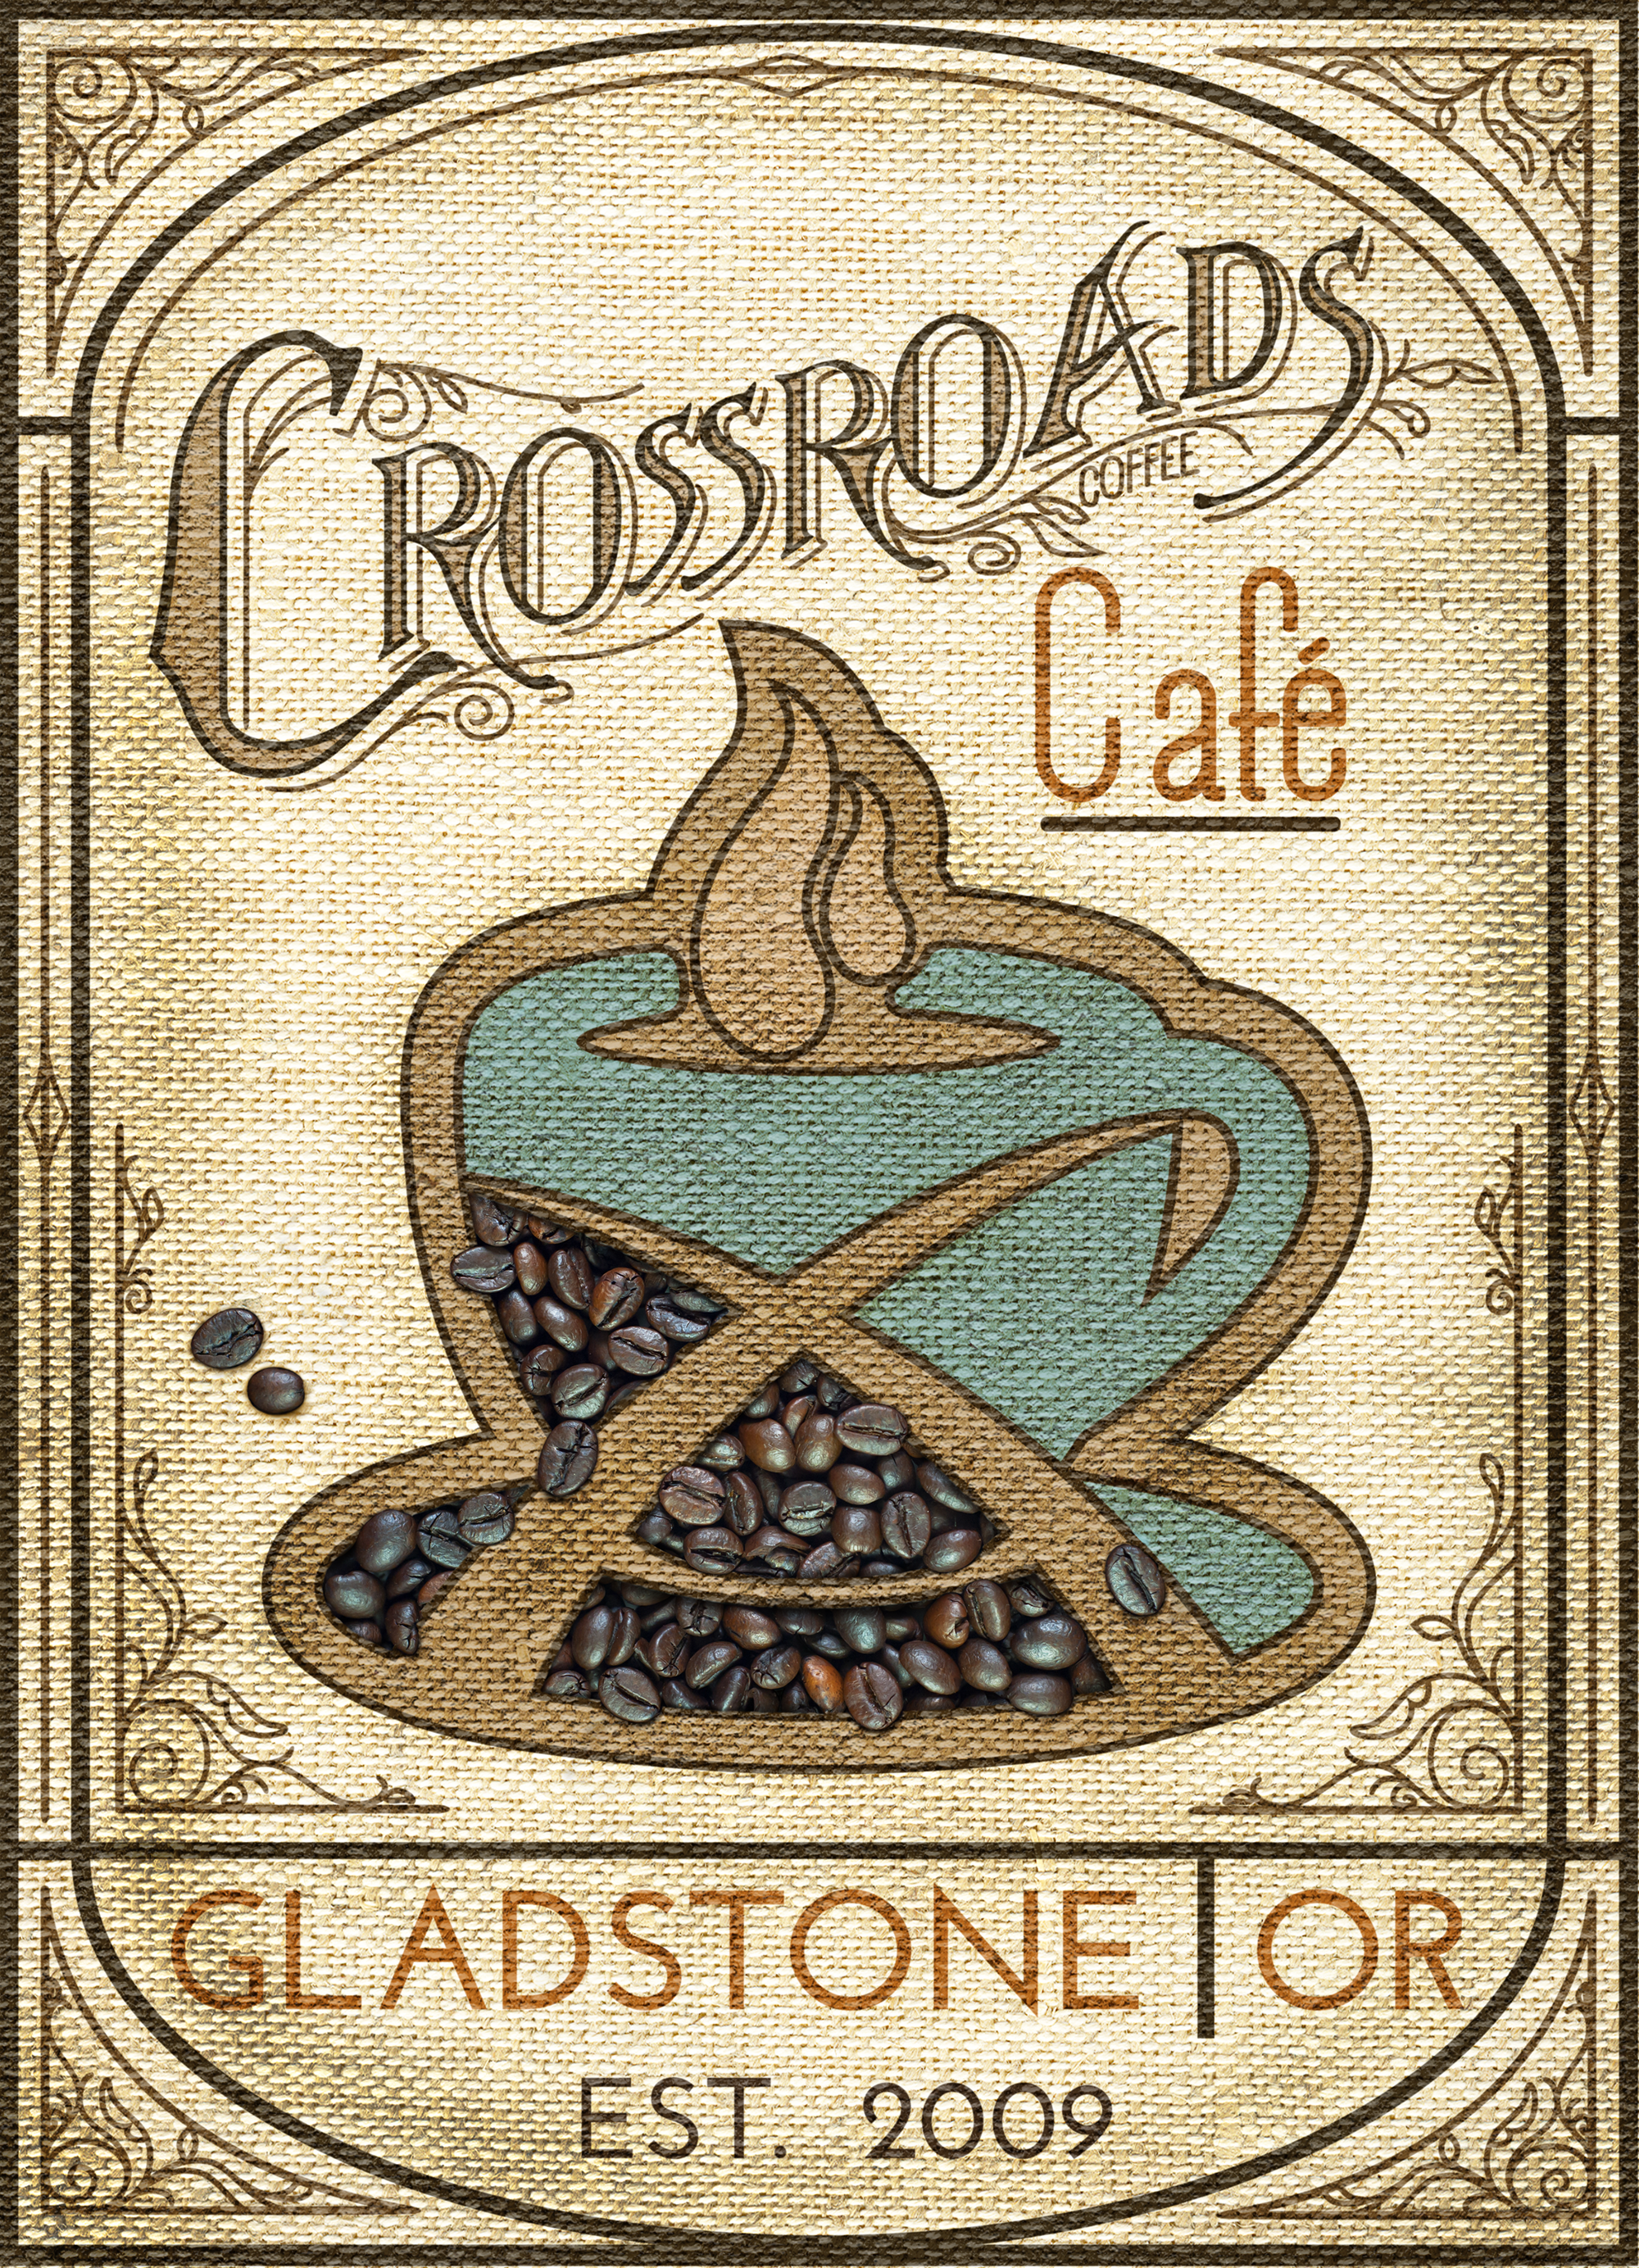 Crossroads Coffee Cafe